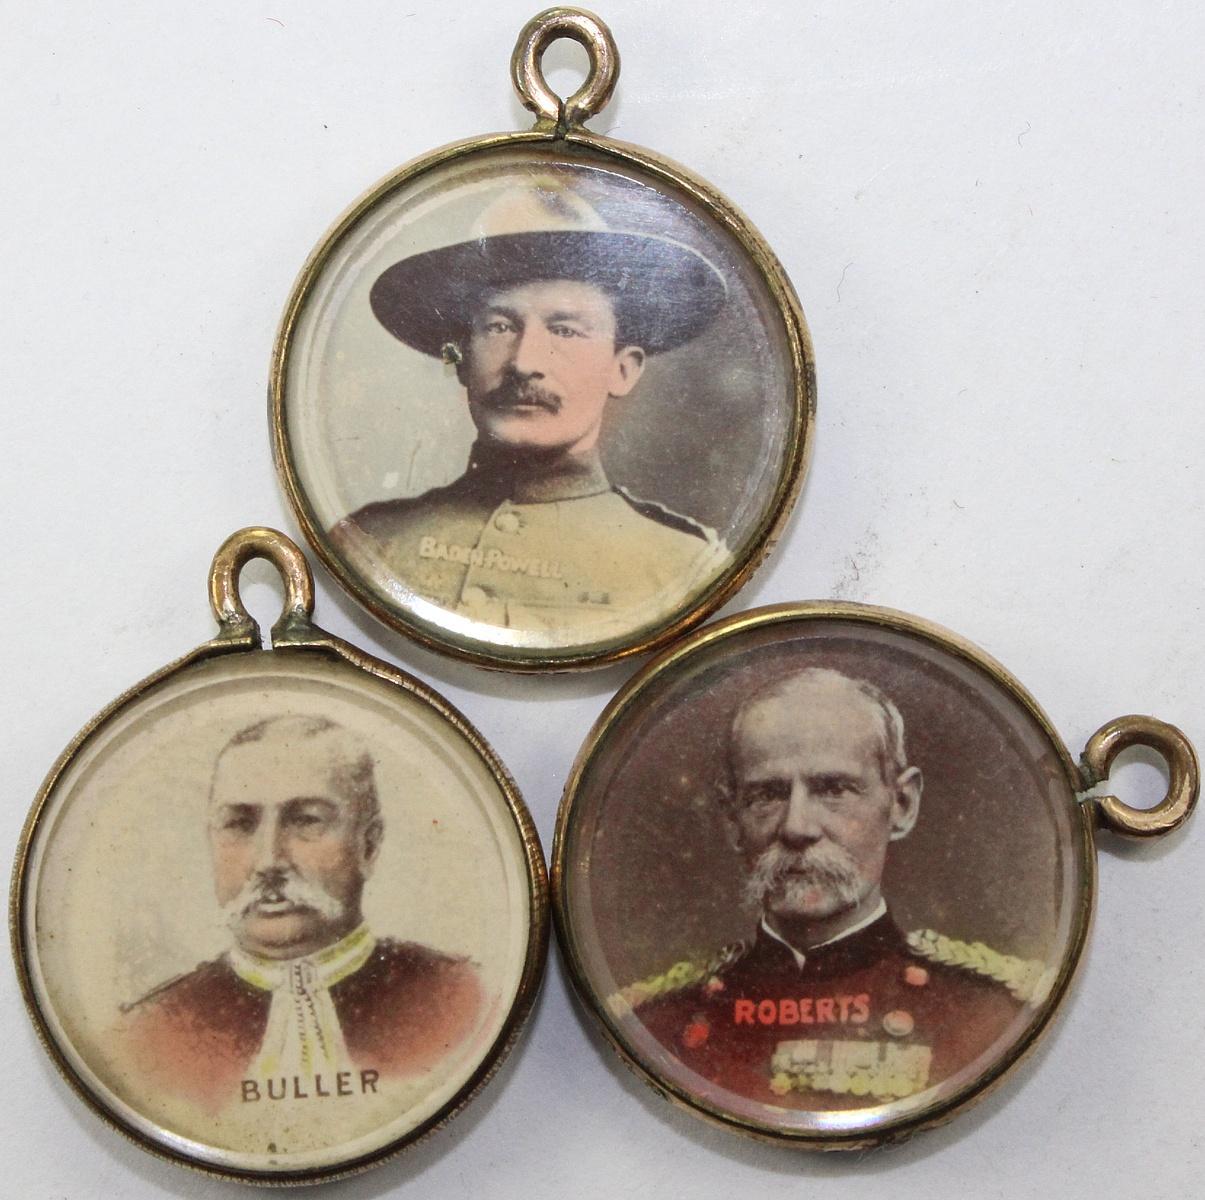 Britain. Patriotic Fobs featuring Queen Victoria and Boer War heroes 'Baden Powell,' 'Roberts' & 'Buller' (3 items)